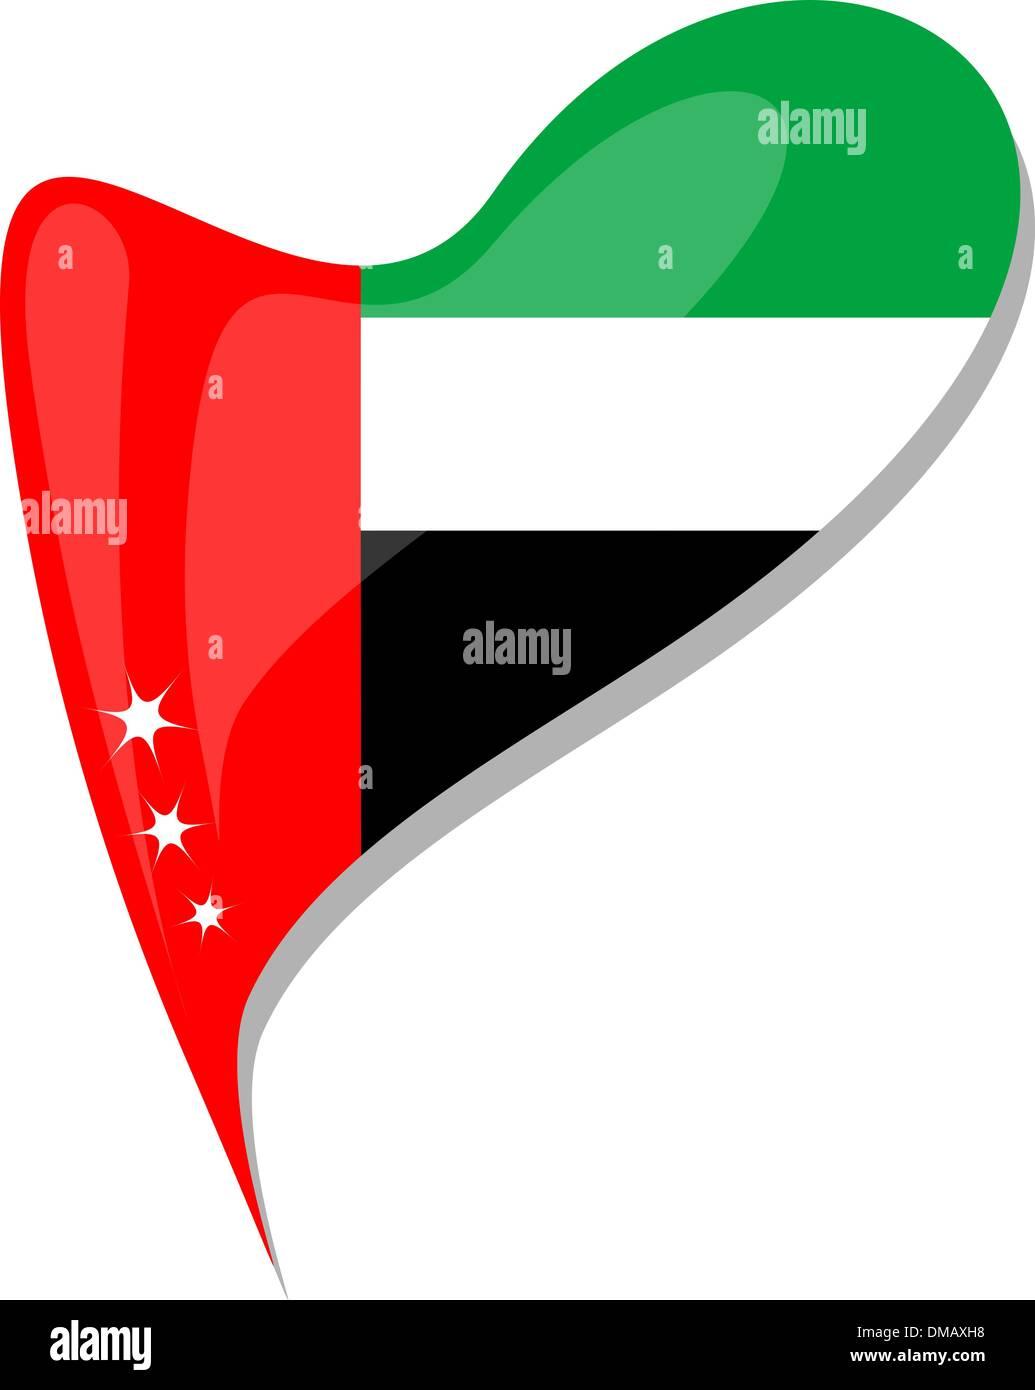 United Arab Emirates flag button heart shape. vector - Stock Image